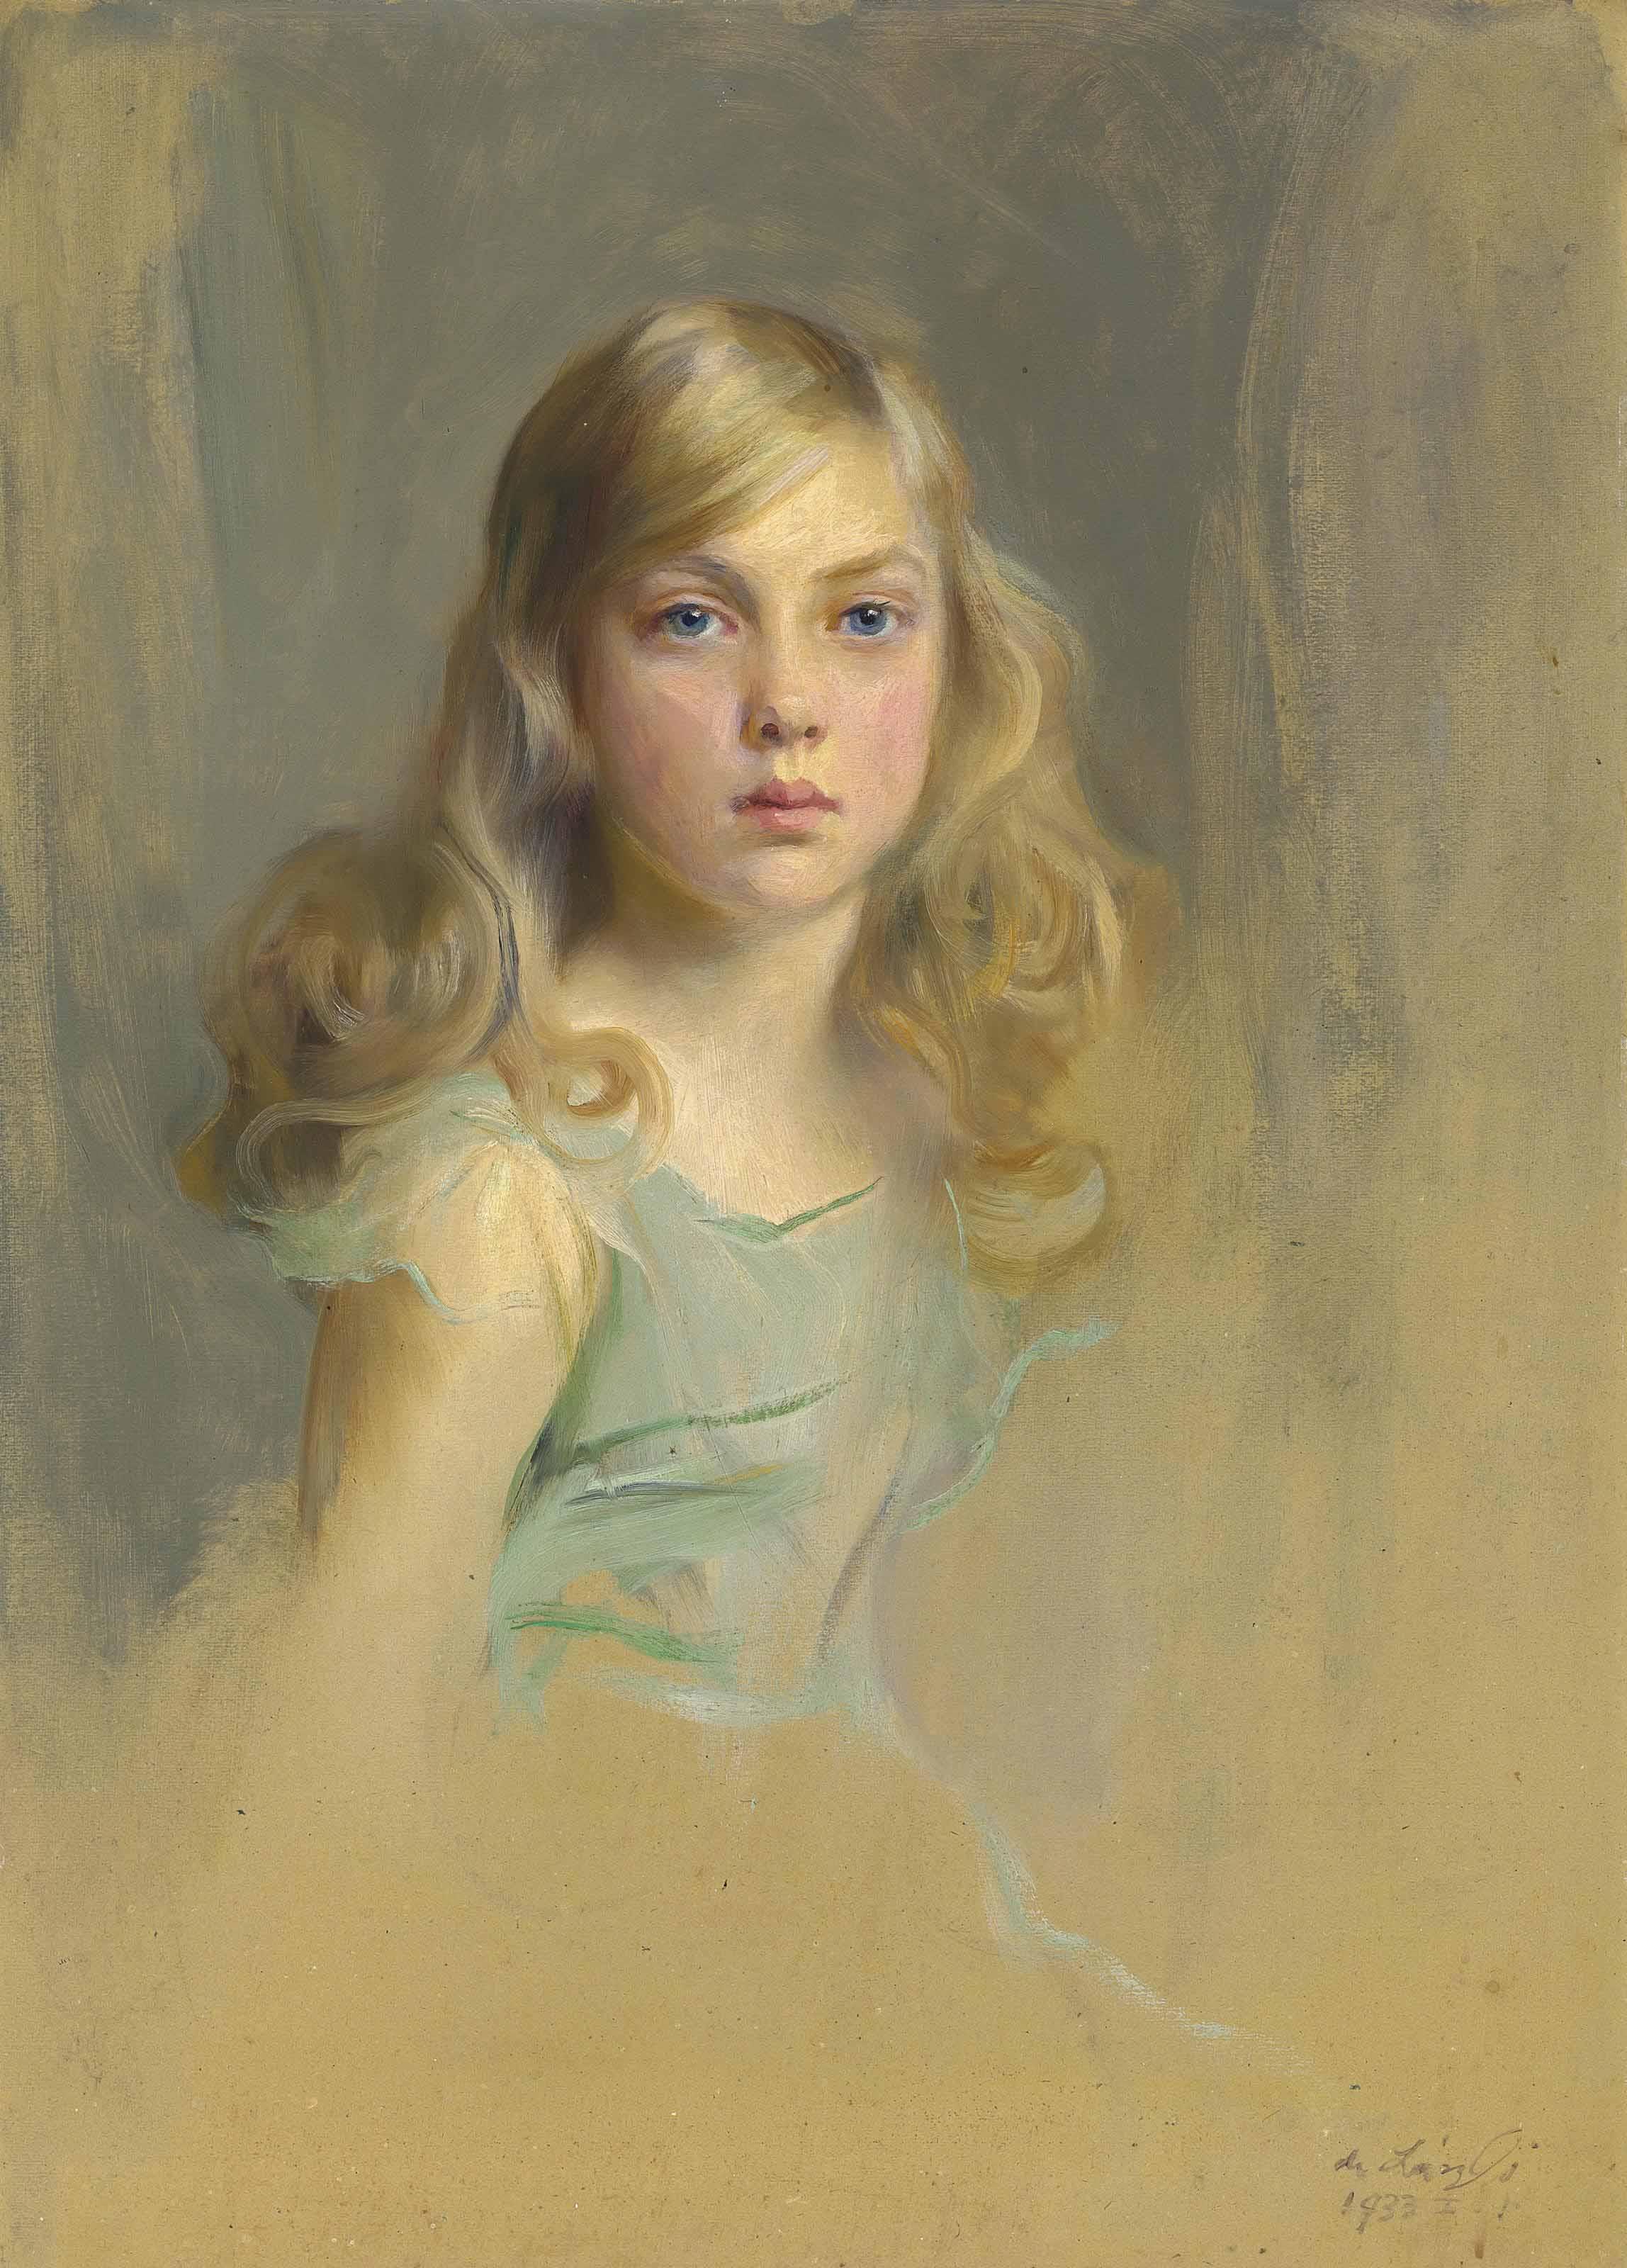 Portrait of the Hon. Esmée Mary Gabrielle Harmsworth, later Countess Cromer, aged nine, half-length